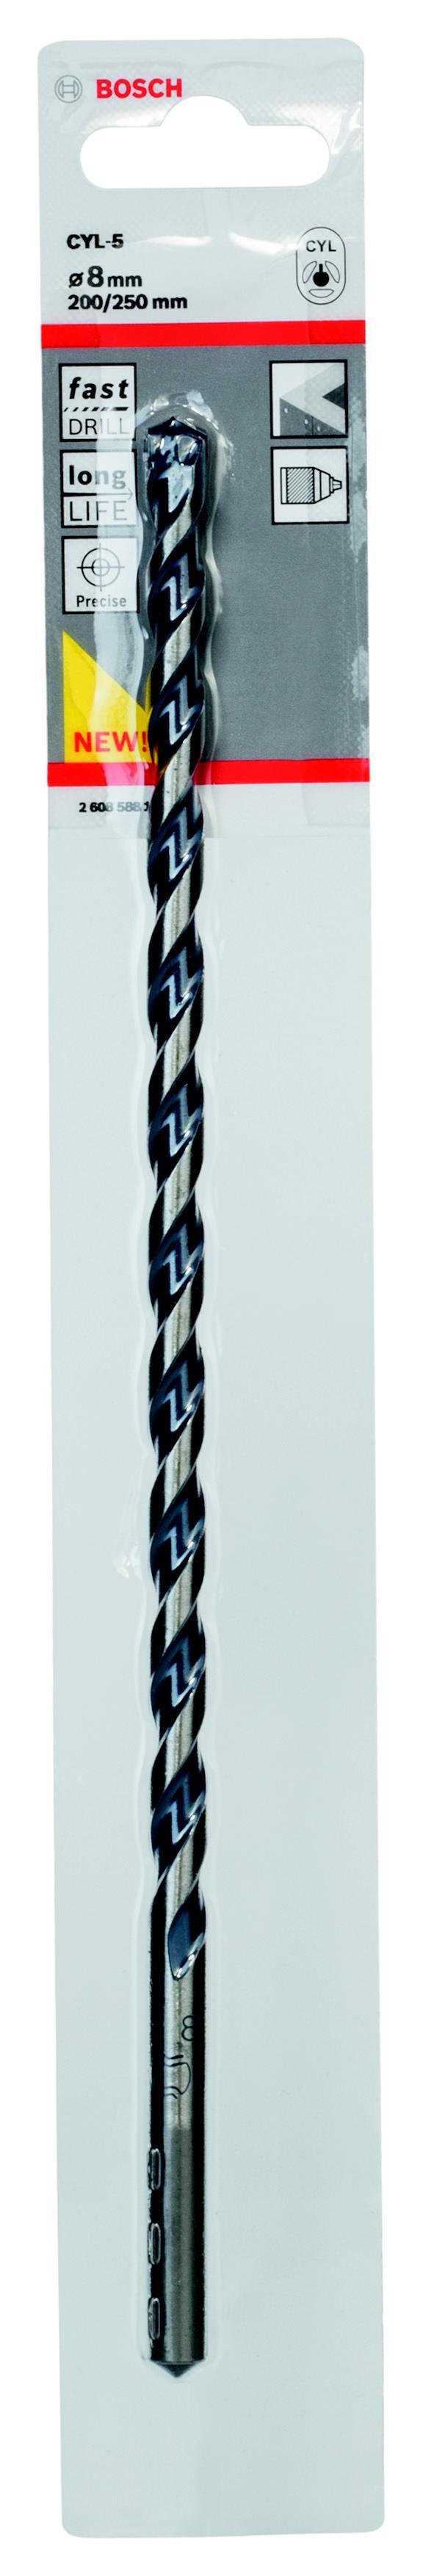 Сверло по камню Bosch Cyl-5 Ф8x200x250мм (2.608.588.153) сверло универсальное bosch cyl 9 multiconstr